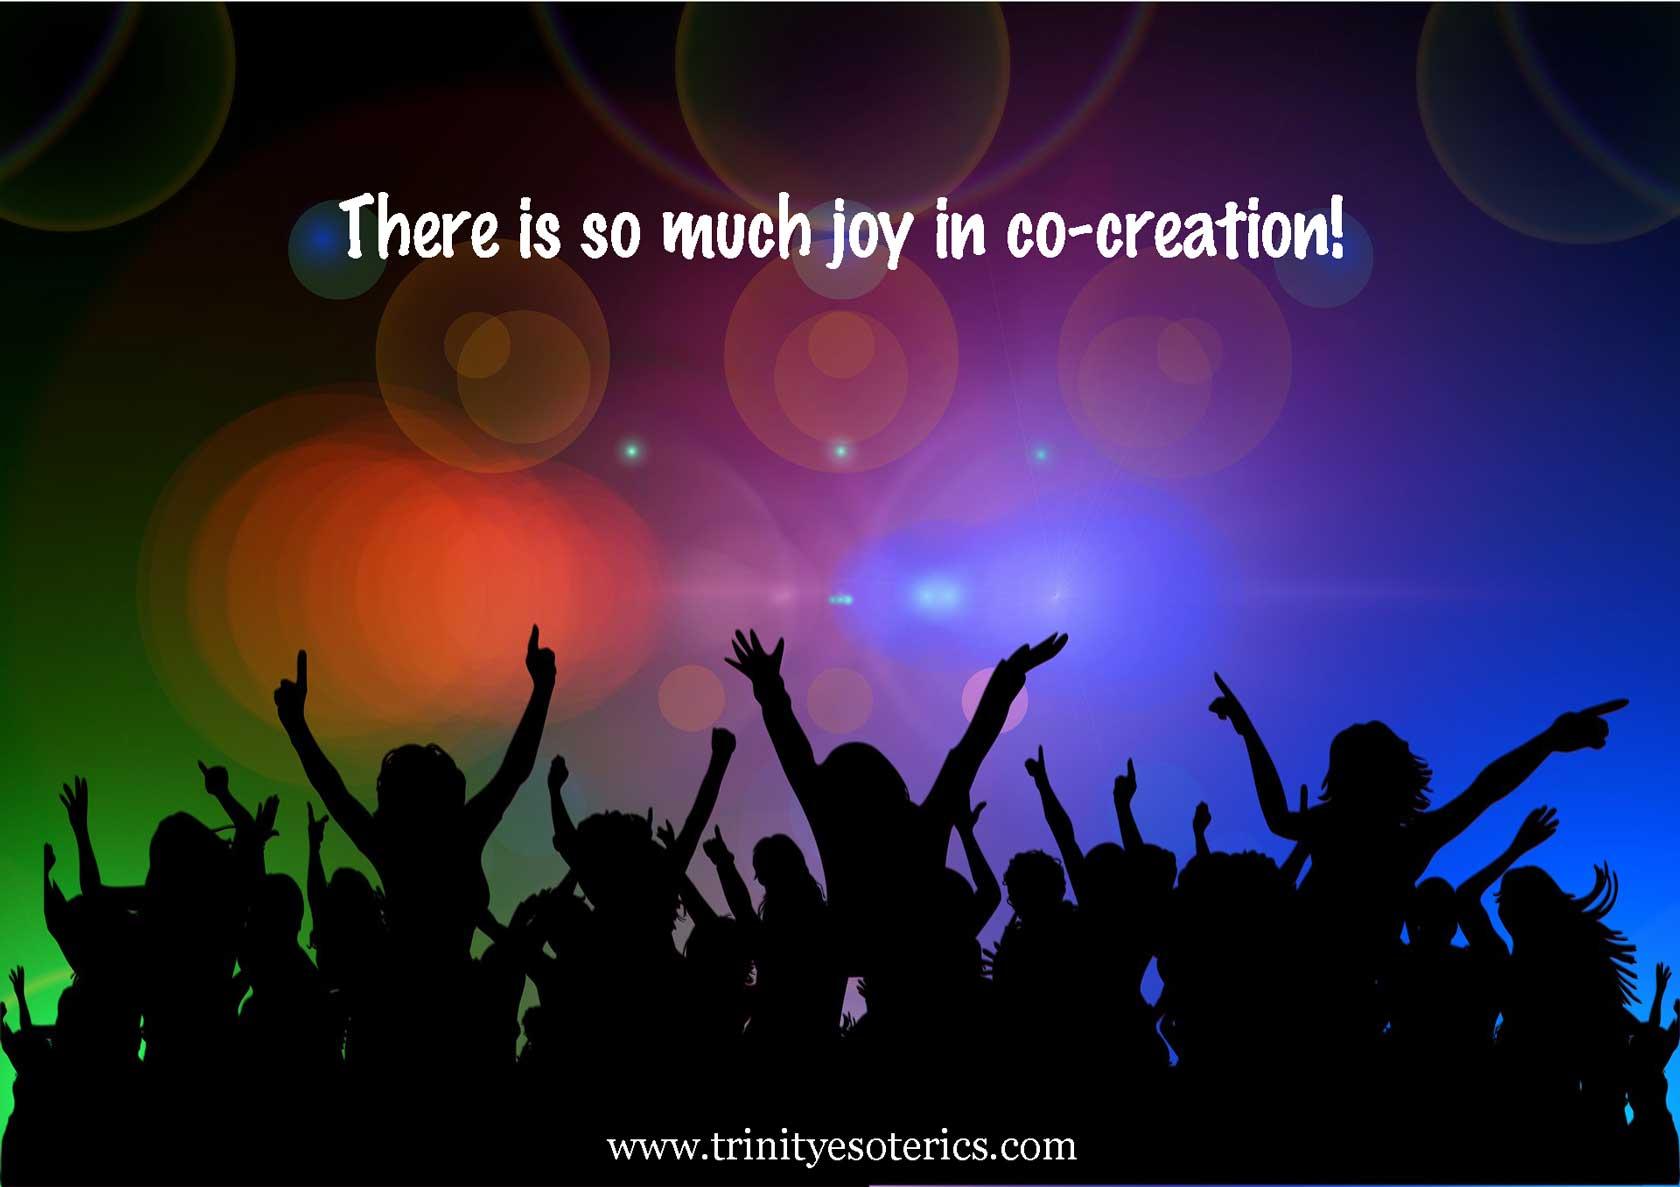 joyful crowd trinity esoterics